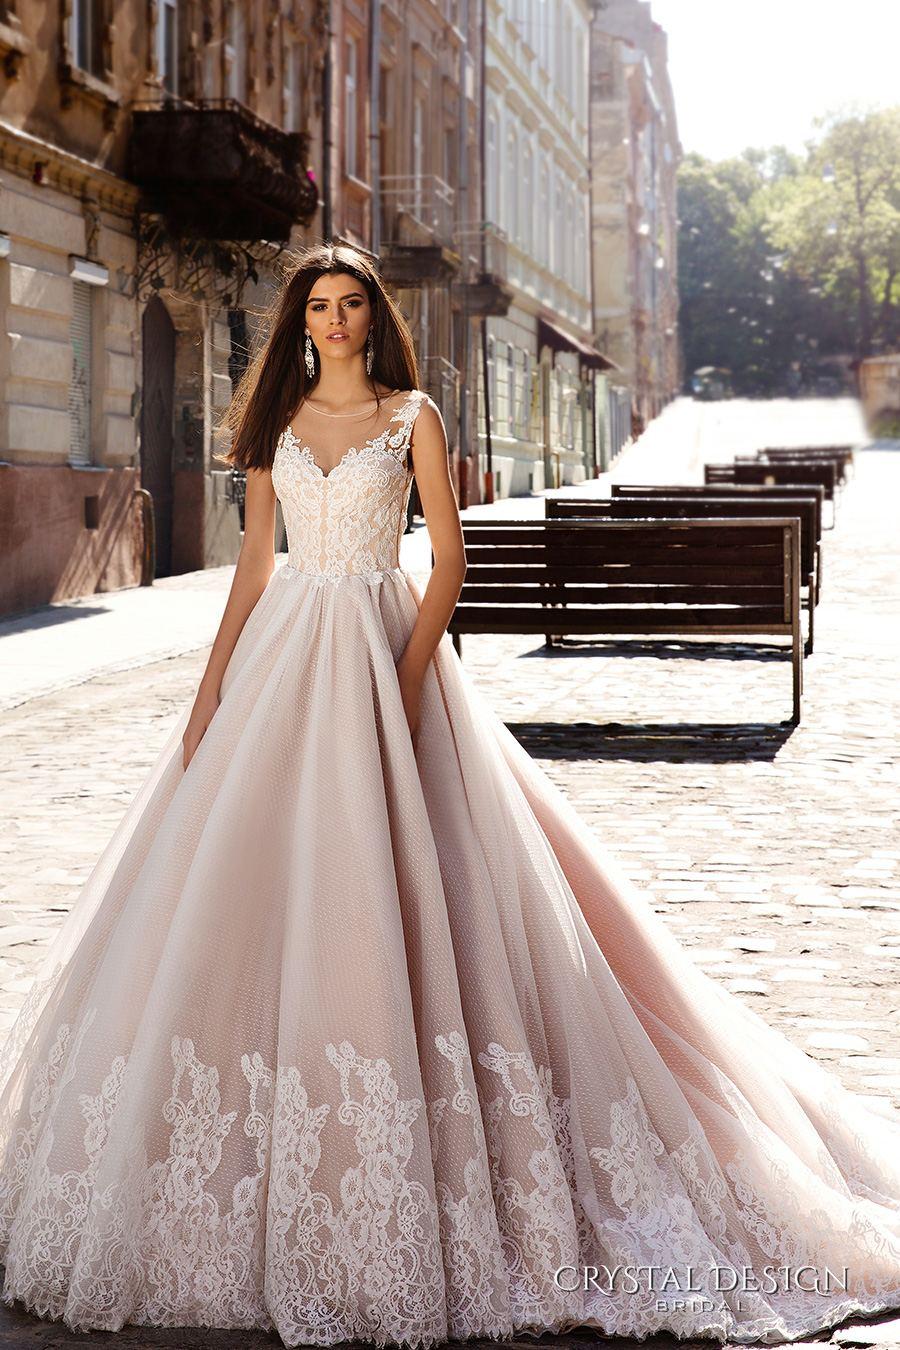 32 Gorgeous Wedding Dresses Ideas for 2019